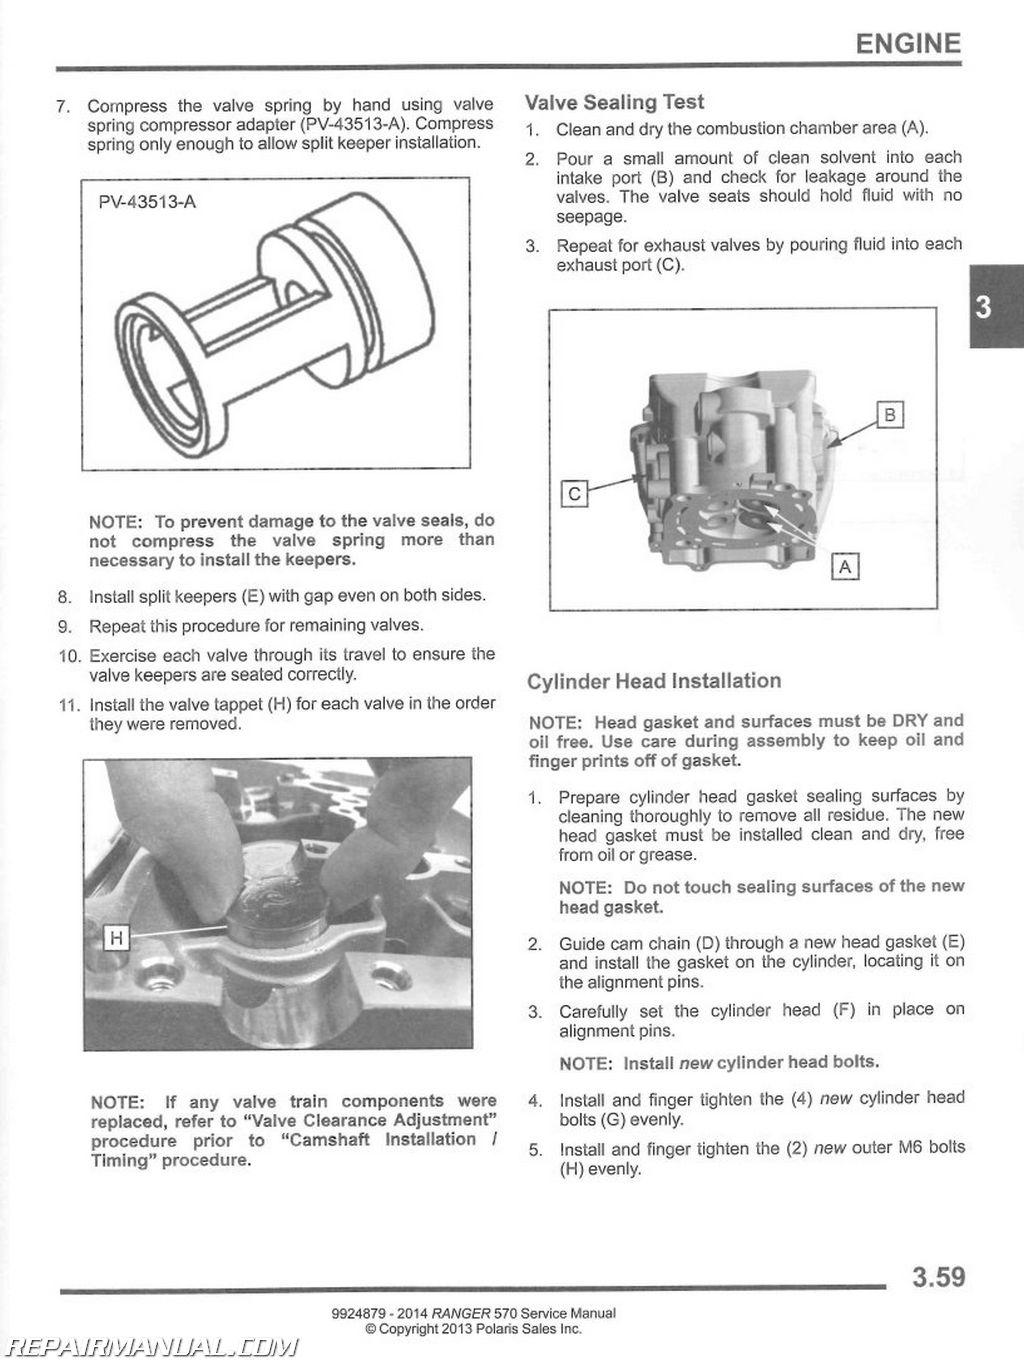 hight resolution of 2014 polari rzr wiring diagram